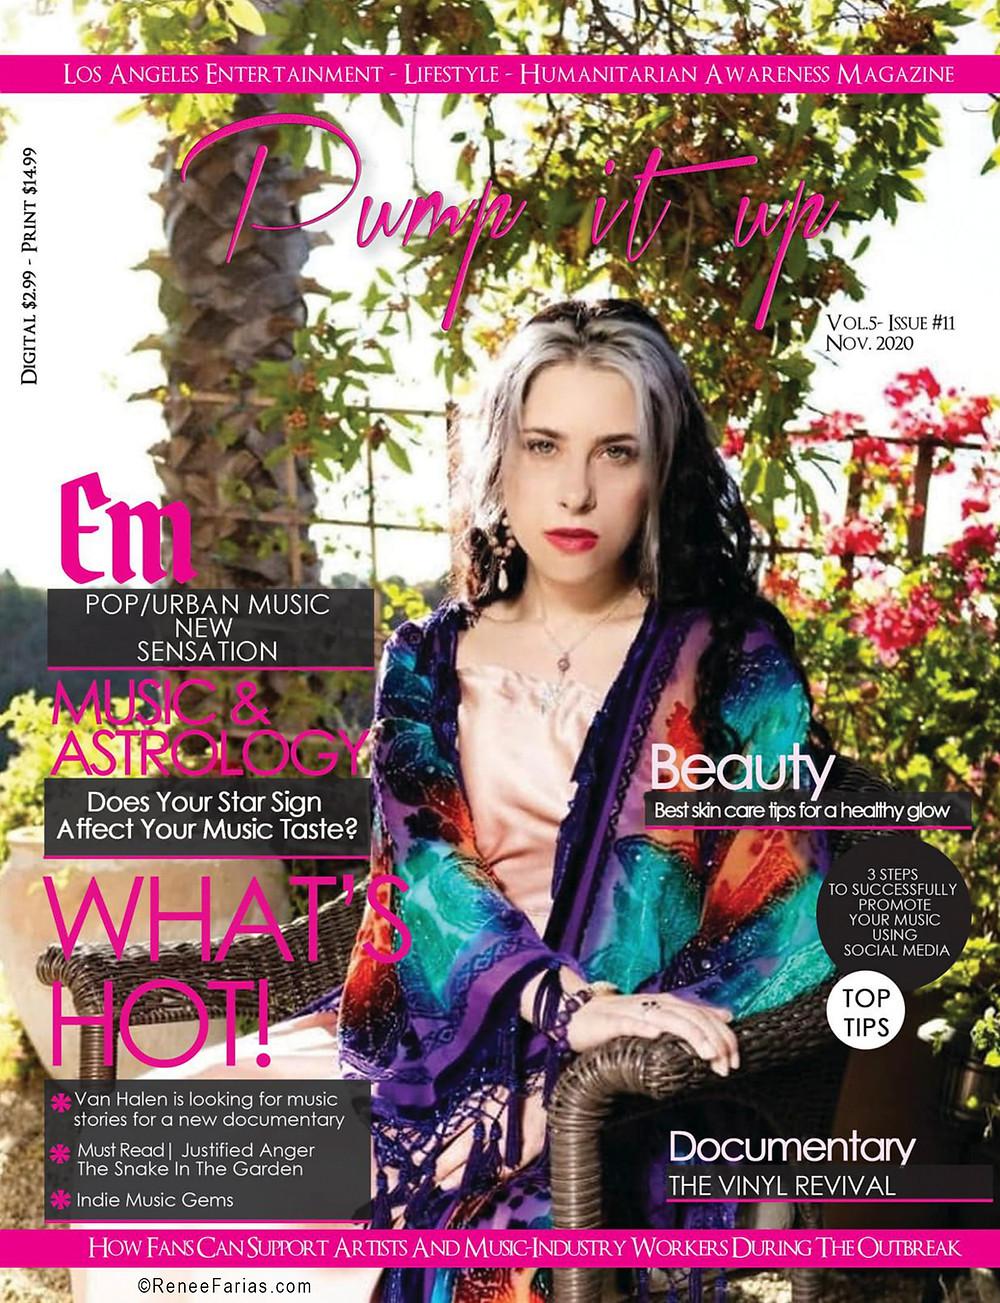 Beauty Branding Photographer in Los Angeles | Renee Farias